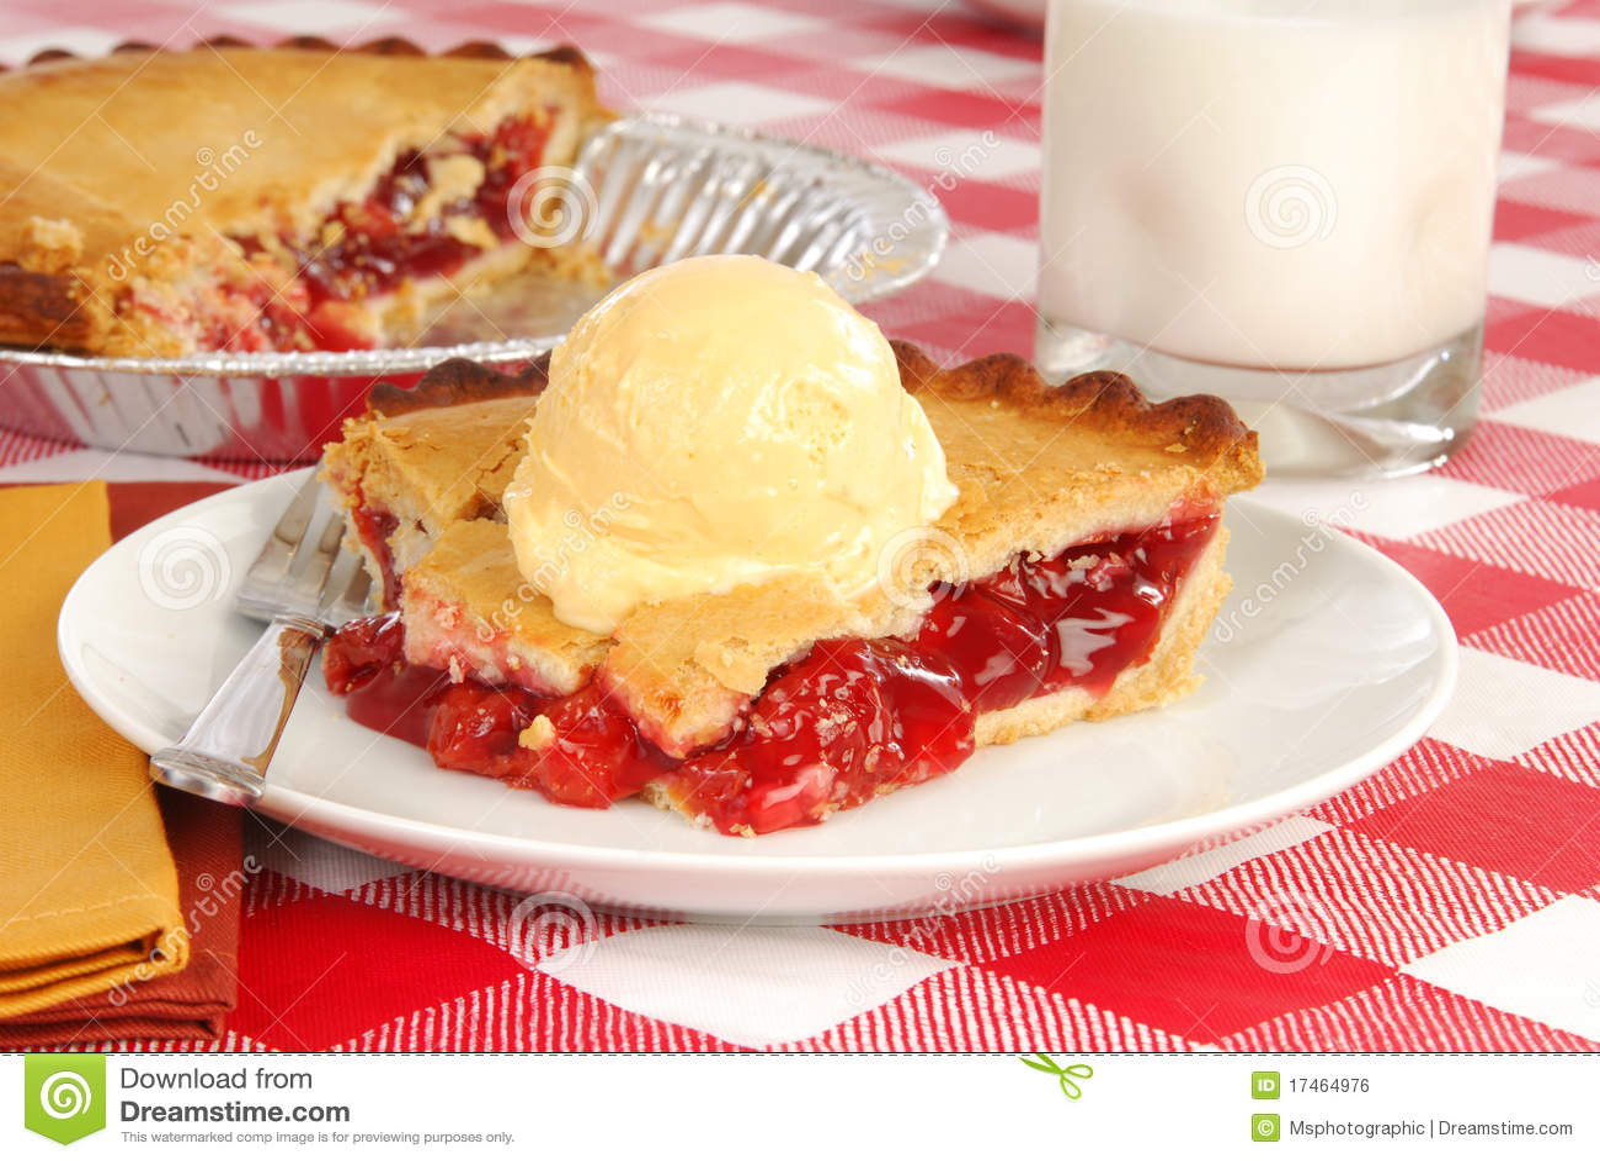 Cherry Pie With Ice Cream Royalty Free Stock Image - Image ...